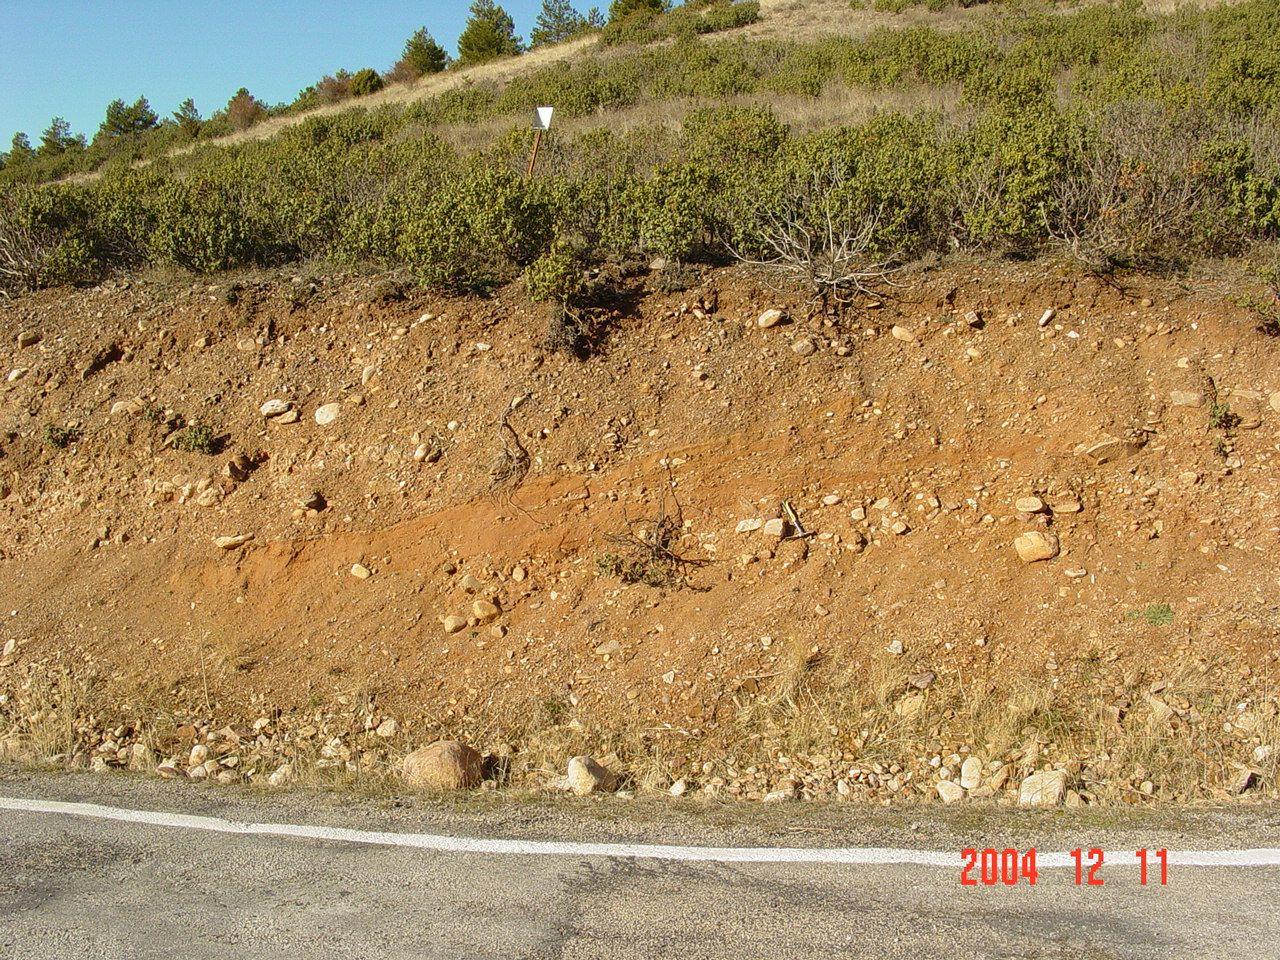 outcropping diamictic impact ejecta, Pelarda Fm., Azuara impact structure